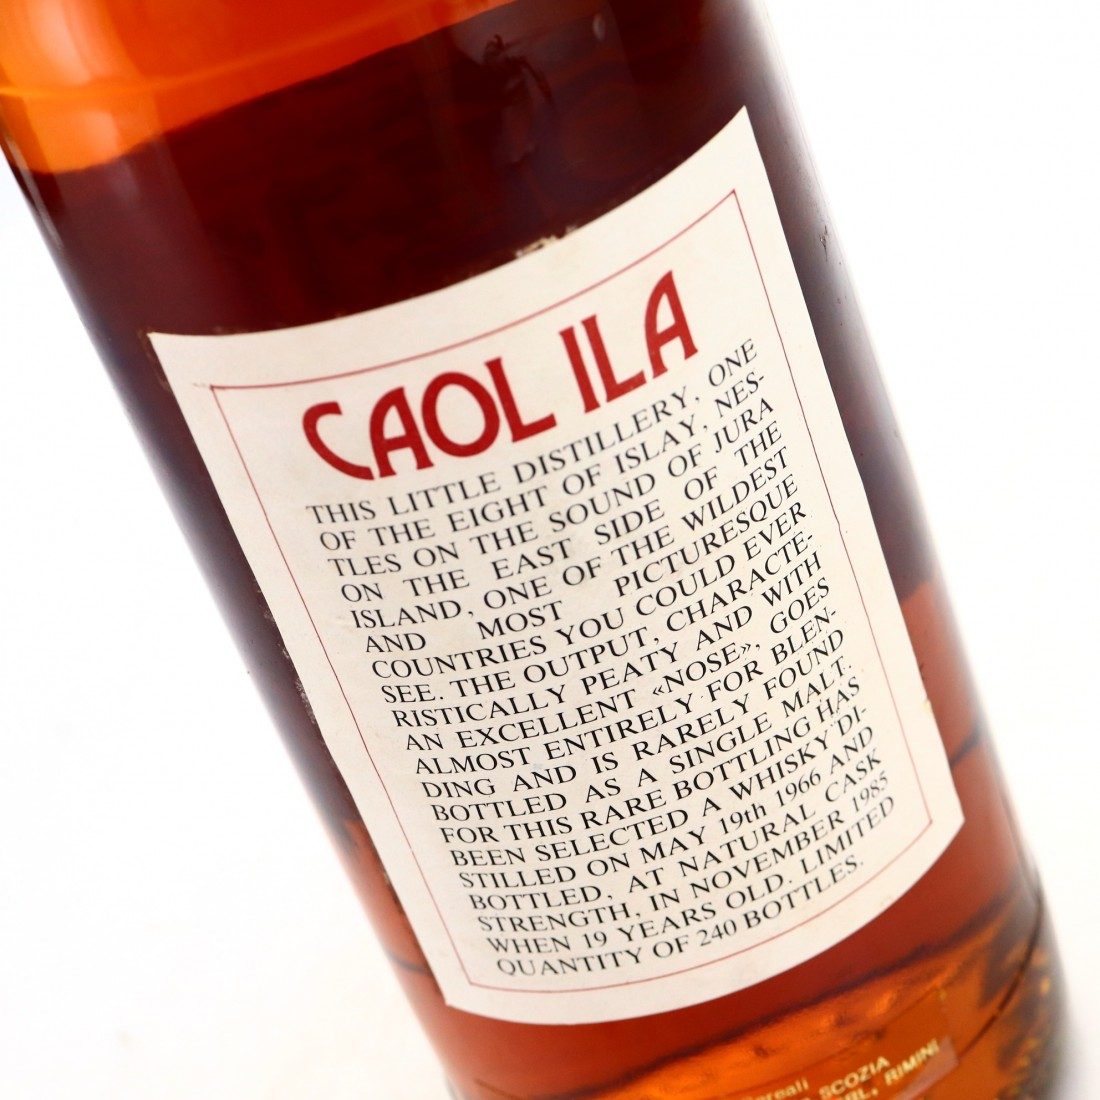 Caol Ila 1966 Intertrade 19 Year Old Cask Strength